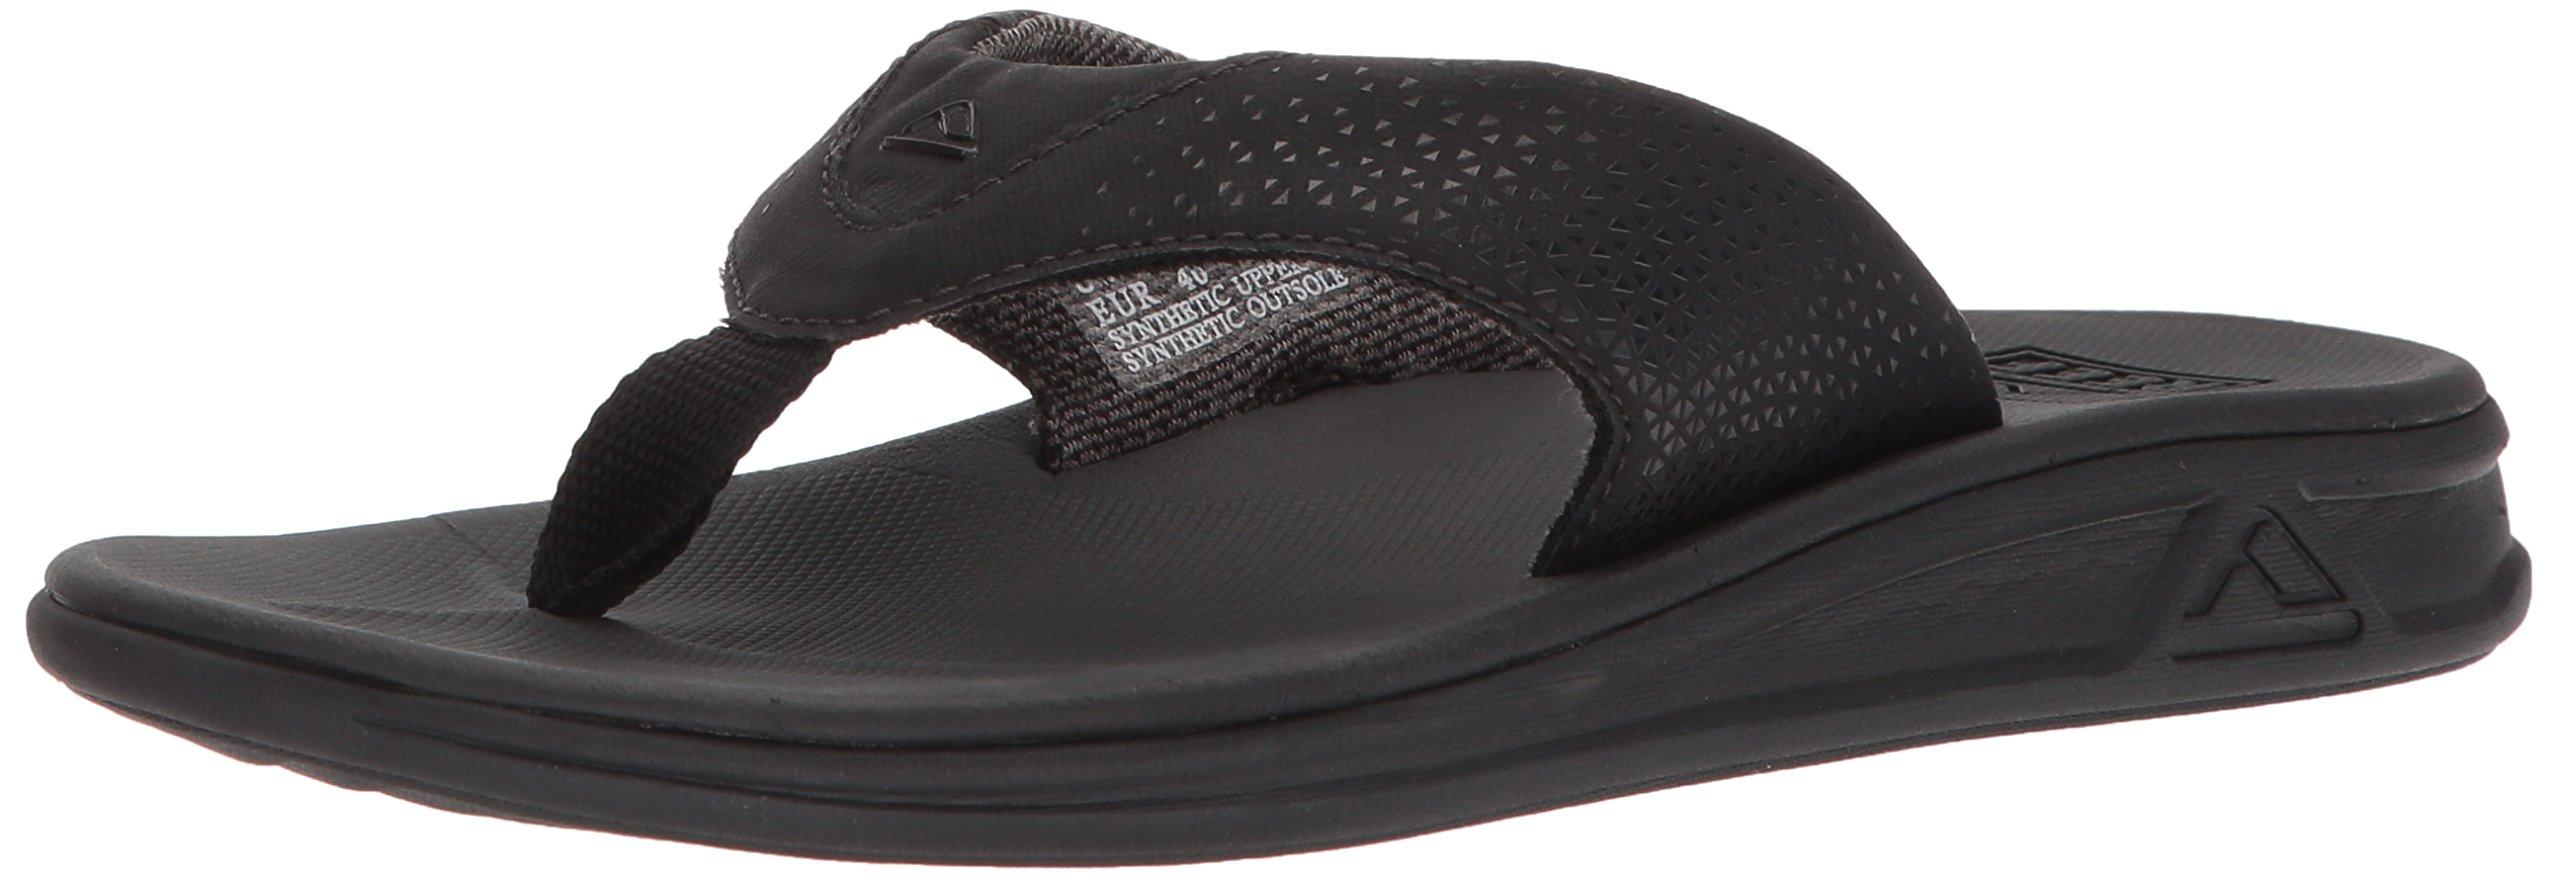 Reef Rover Mens Sandals | Athletic Sports Sandals for Men,11 M US,Black